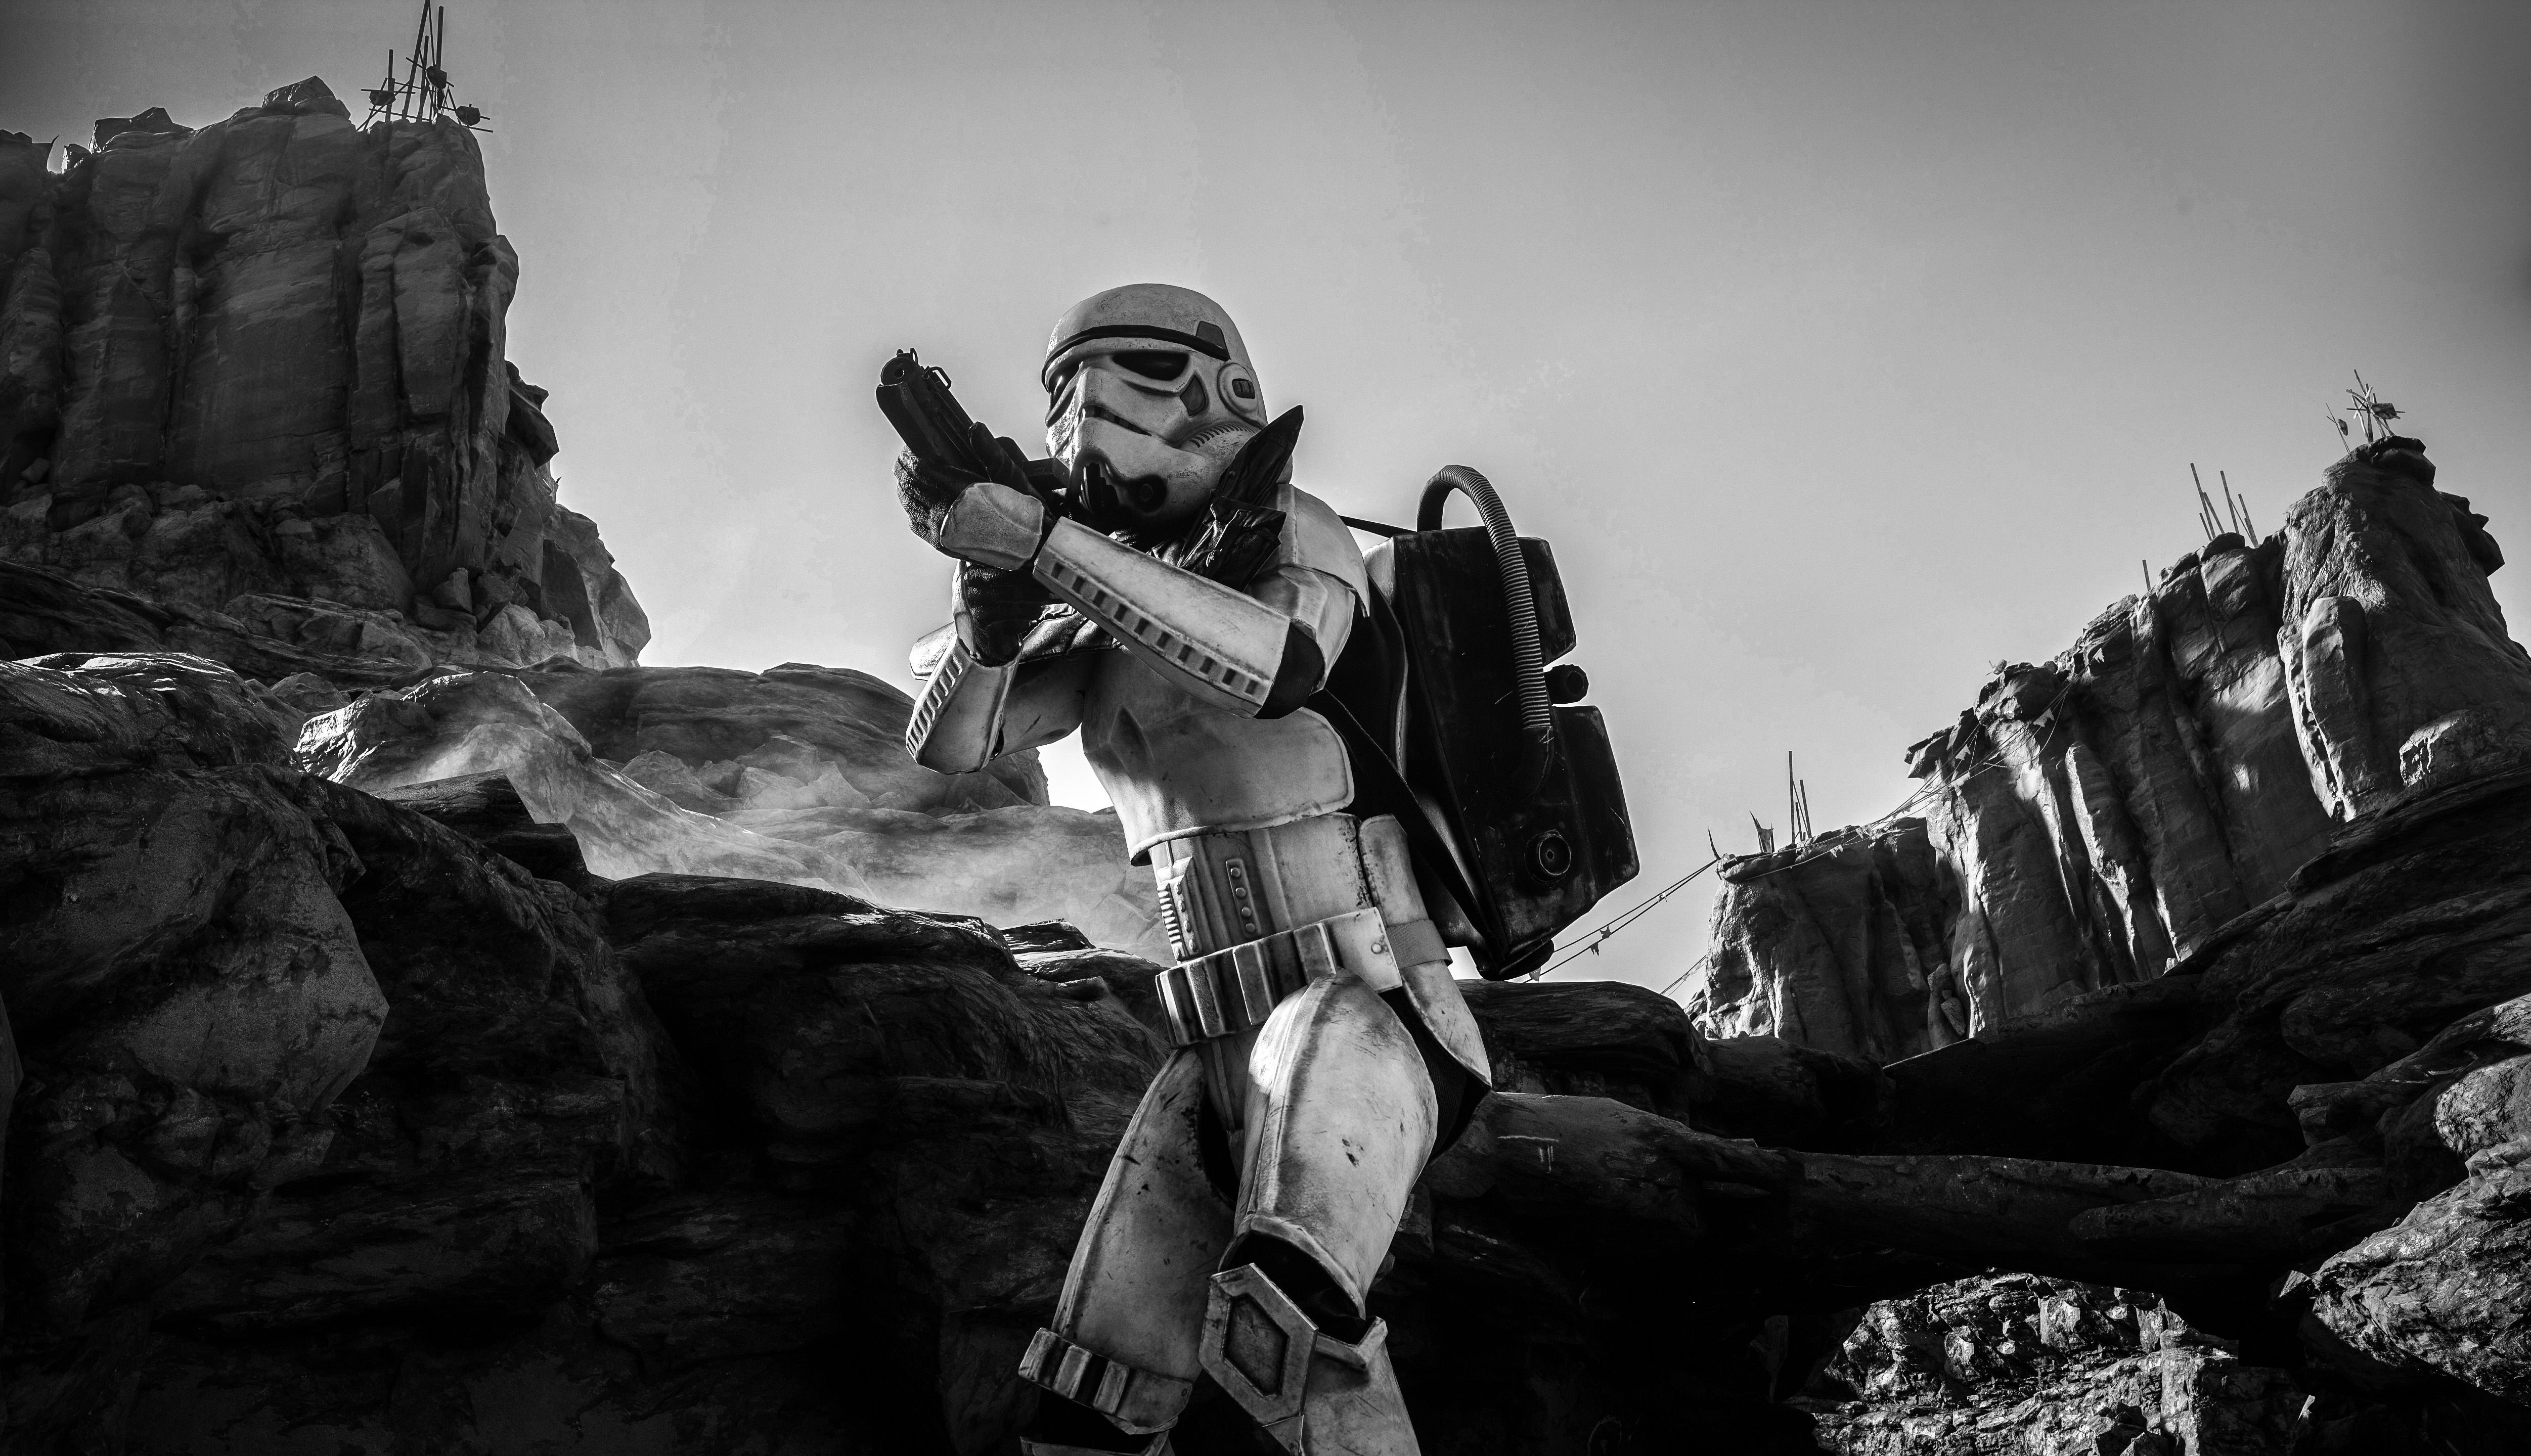 Stormtrooper hd movies 4k wallpapers images - 4k star wars wallpaper ...